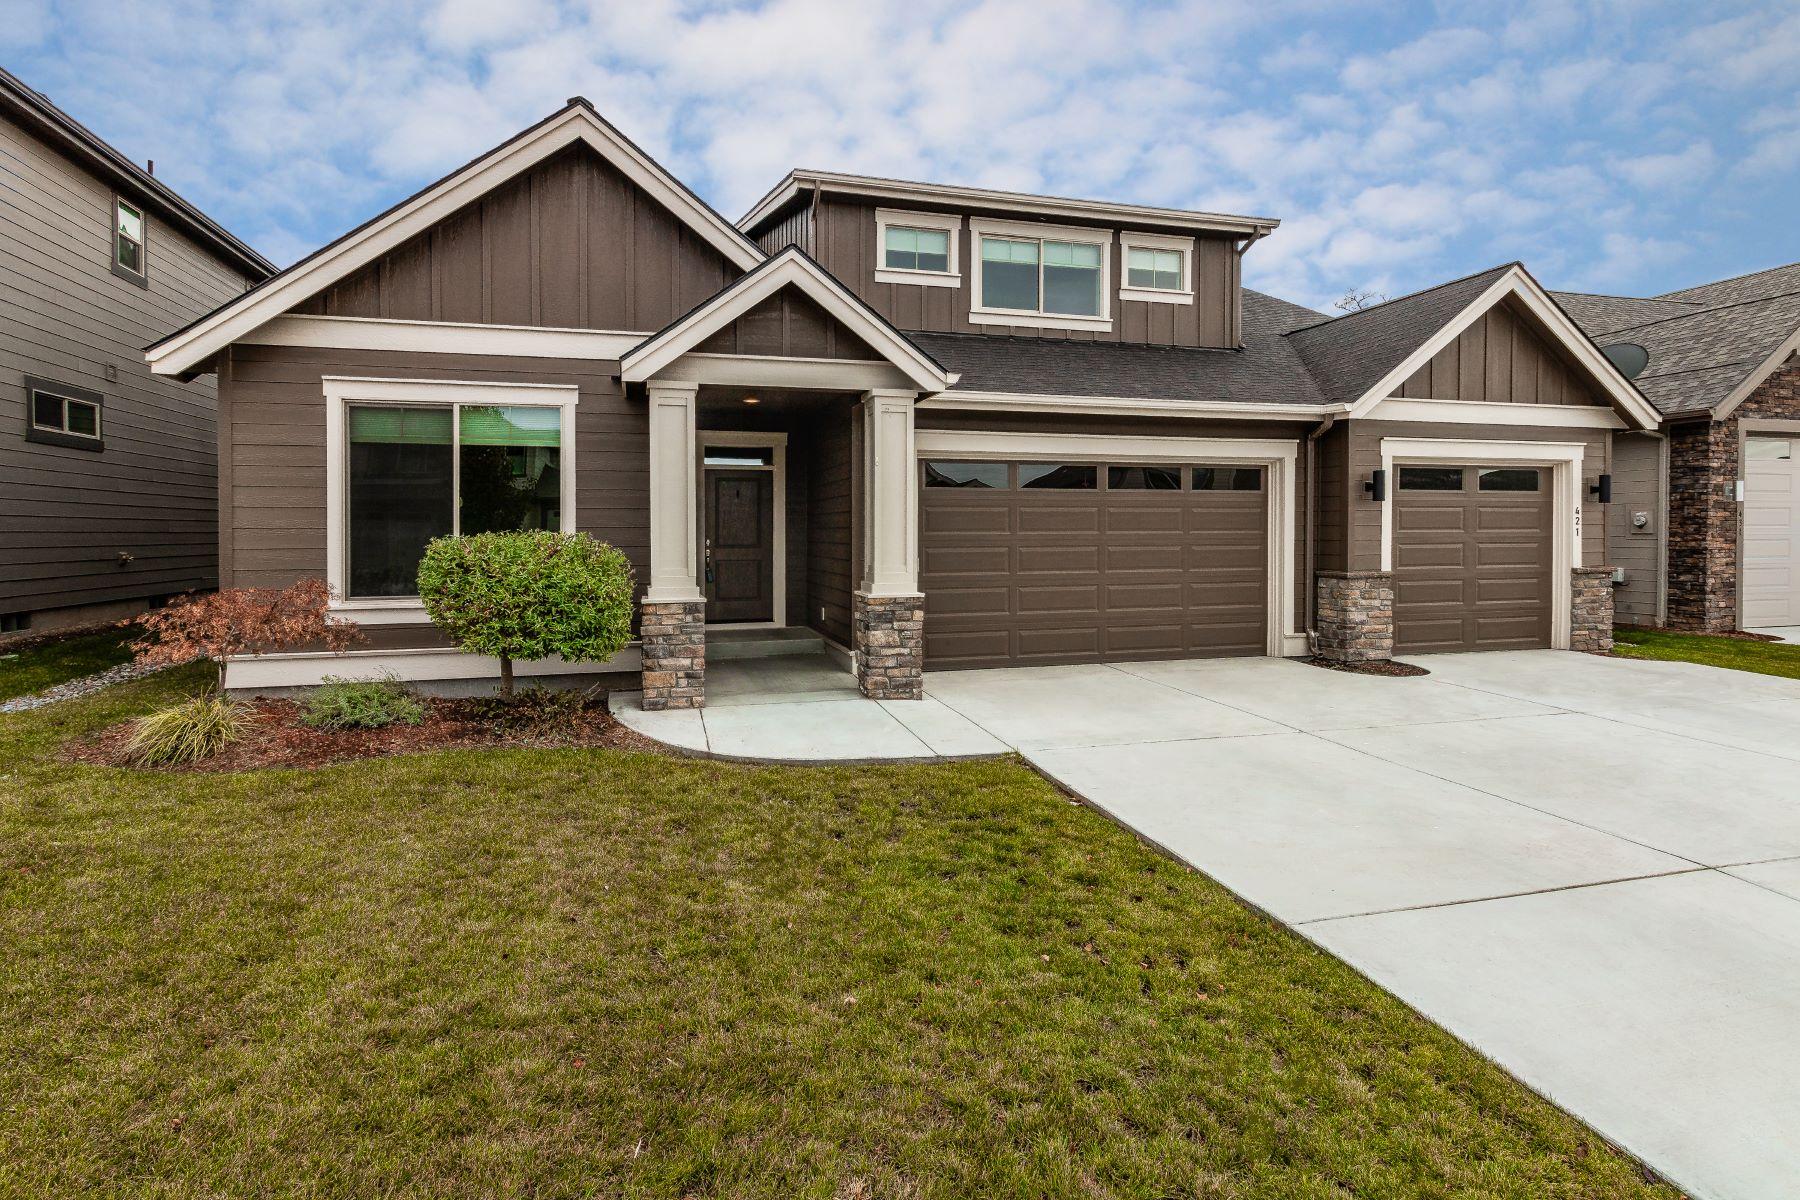 Single Family Homes for Sale at 421 Reserve Way Walla Walla, Washington 99362 United States